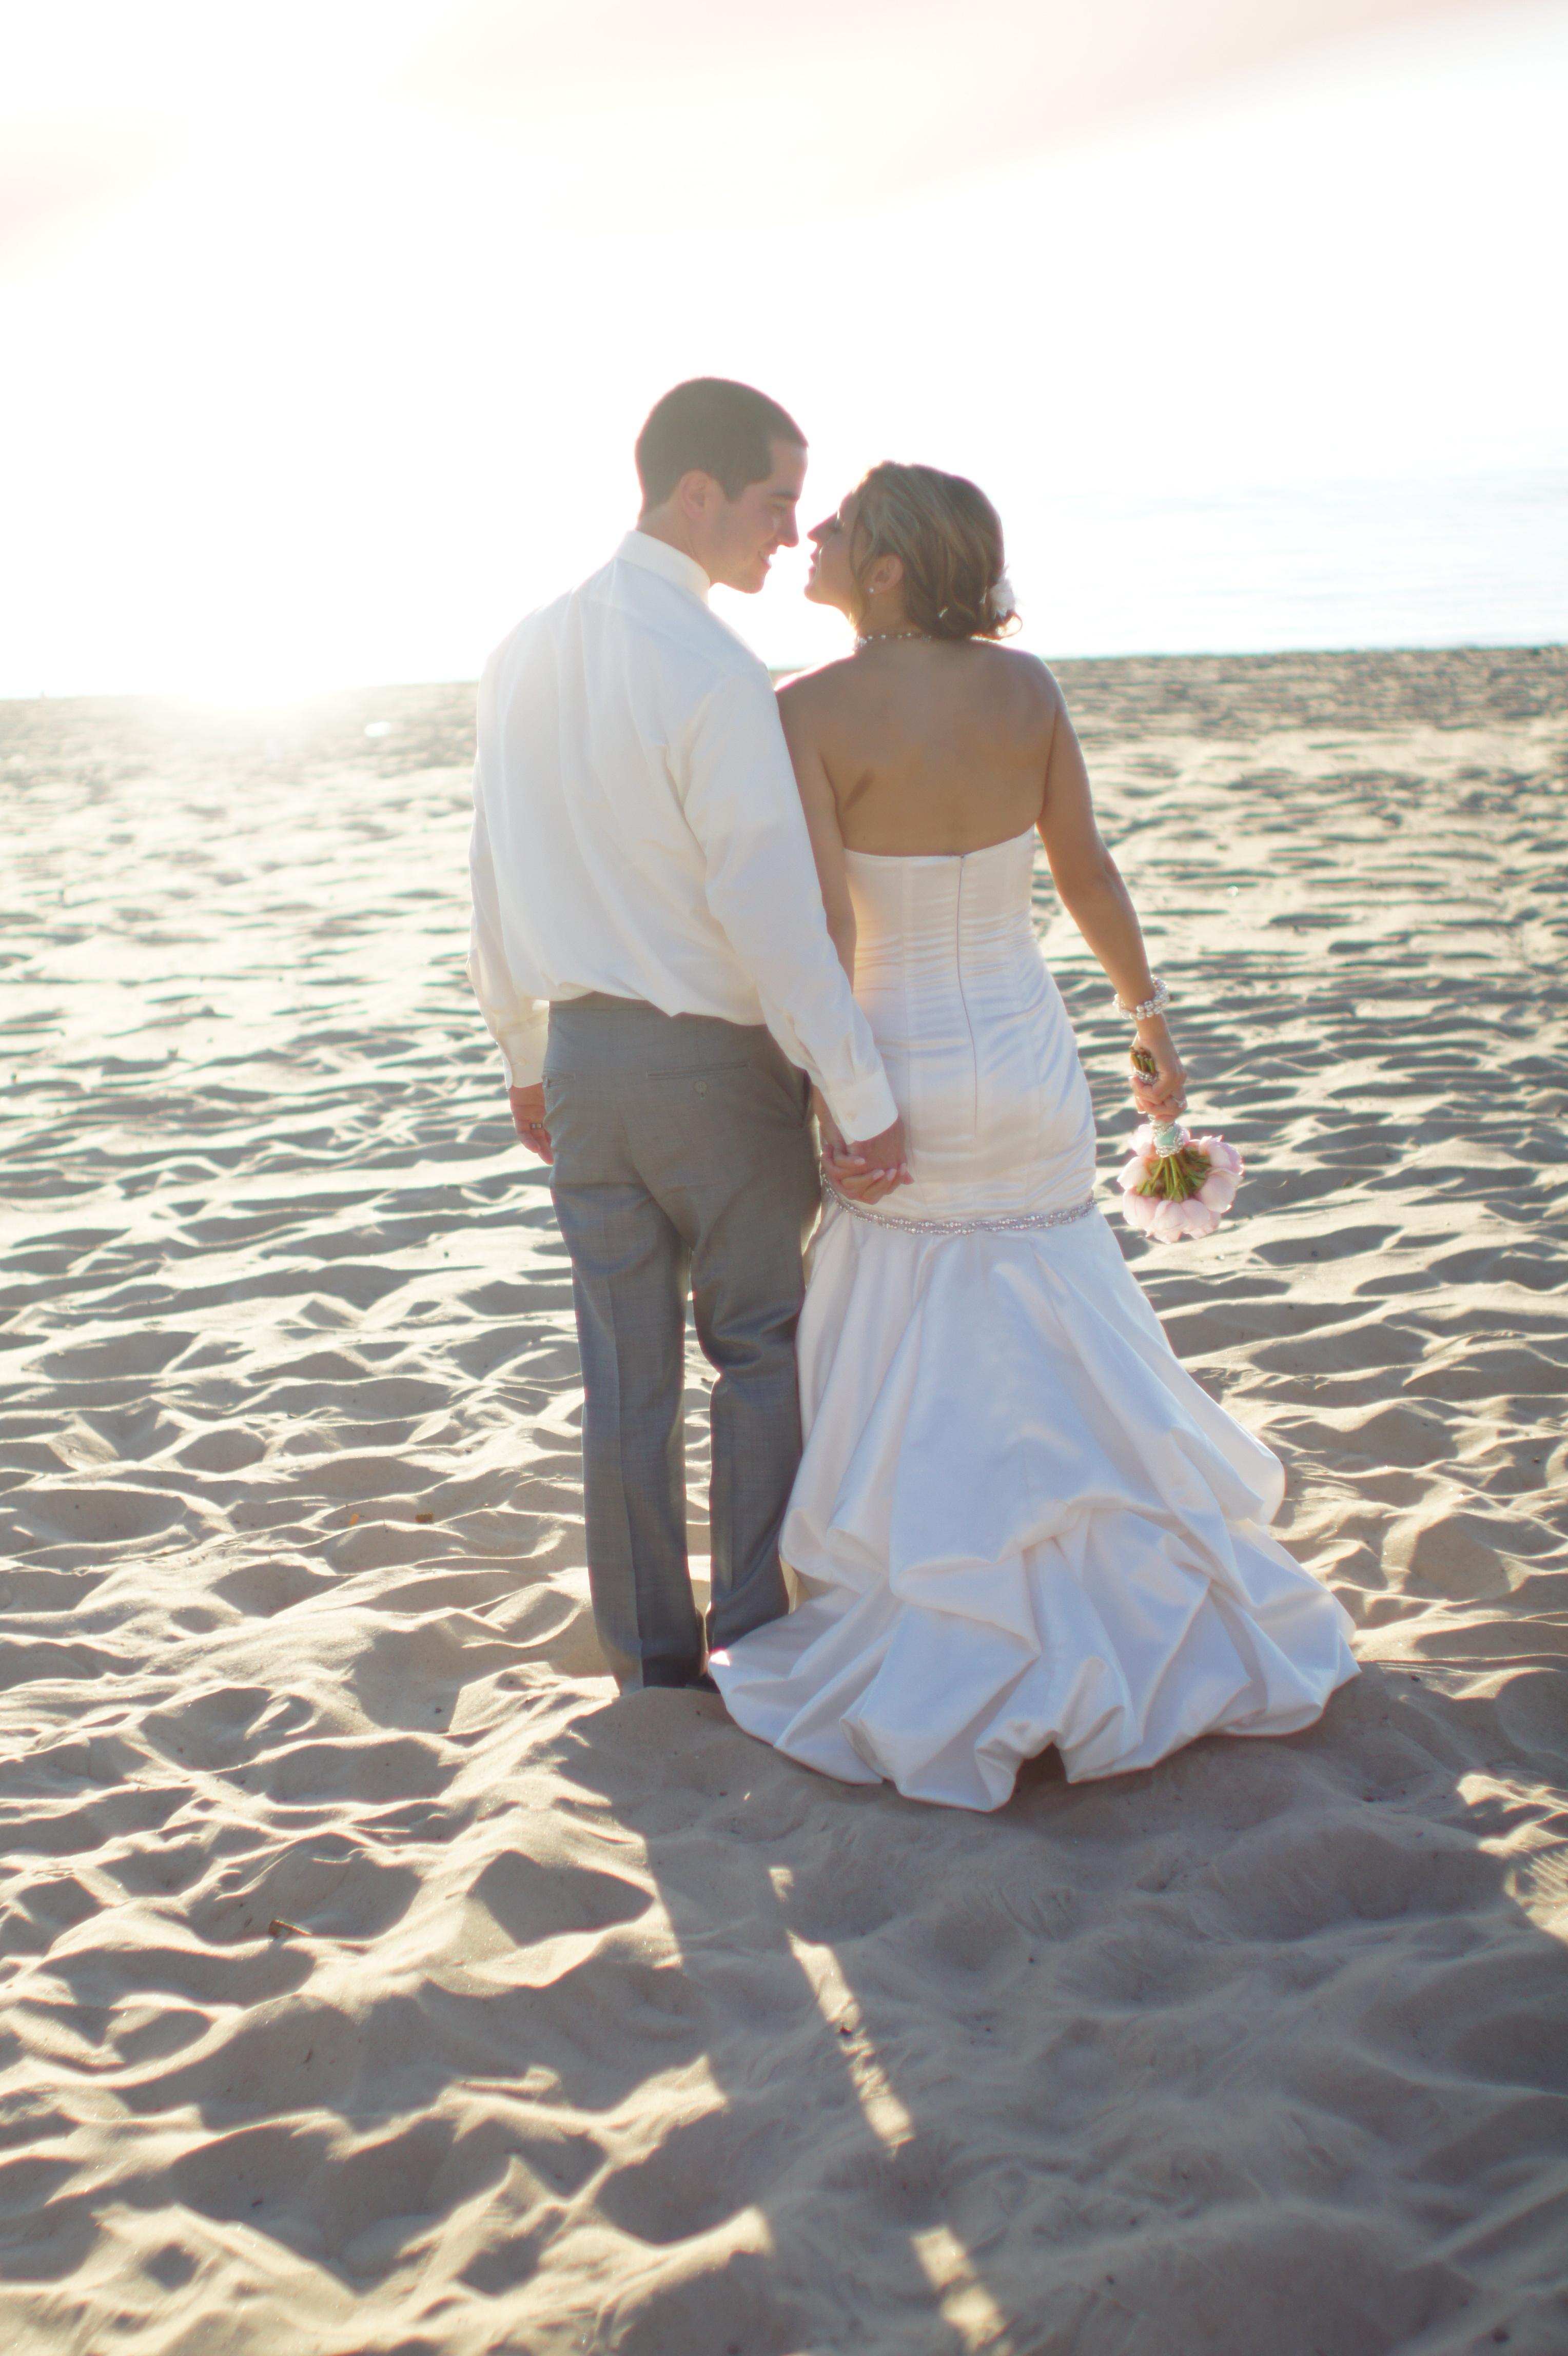 Flowers & Decor, Wedding Dresses, Mermaid Wedding Dresses, Beach Wedding Dresses, Fashion, dress, Beach, Flowers, Beach Wedding Flowers & Decor, Mermaid, Flower Wedding Dresses